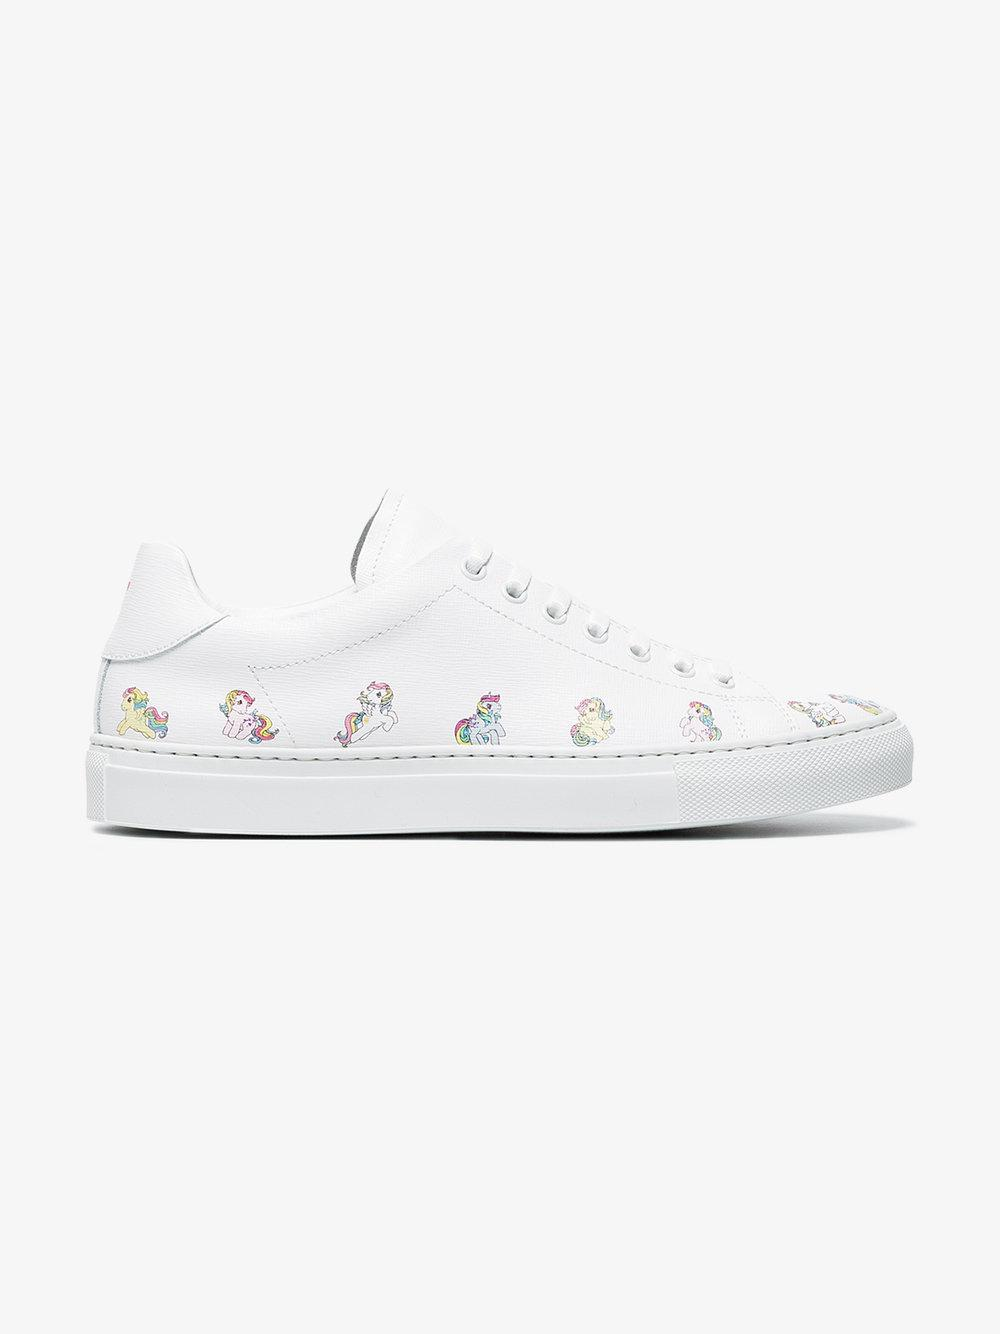 Joshua Sanders Leather My Little Pony Sneakers in White